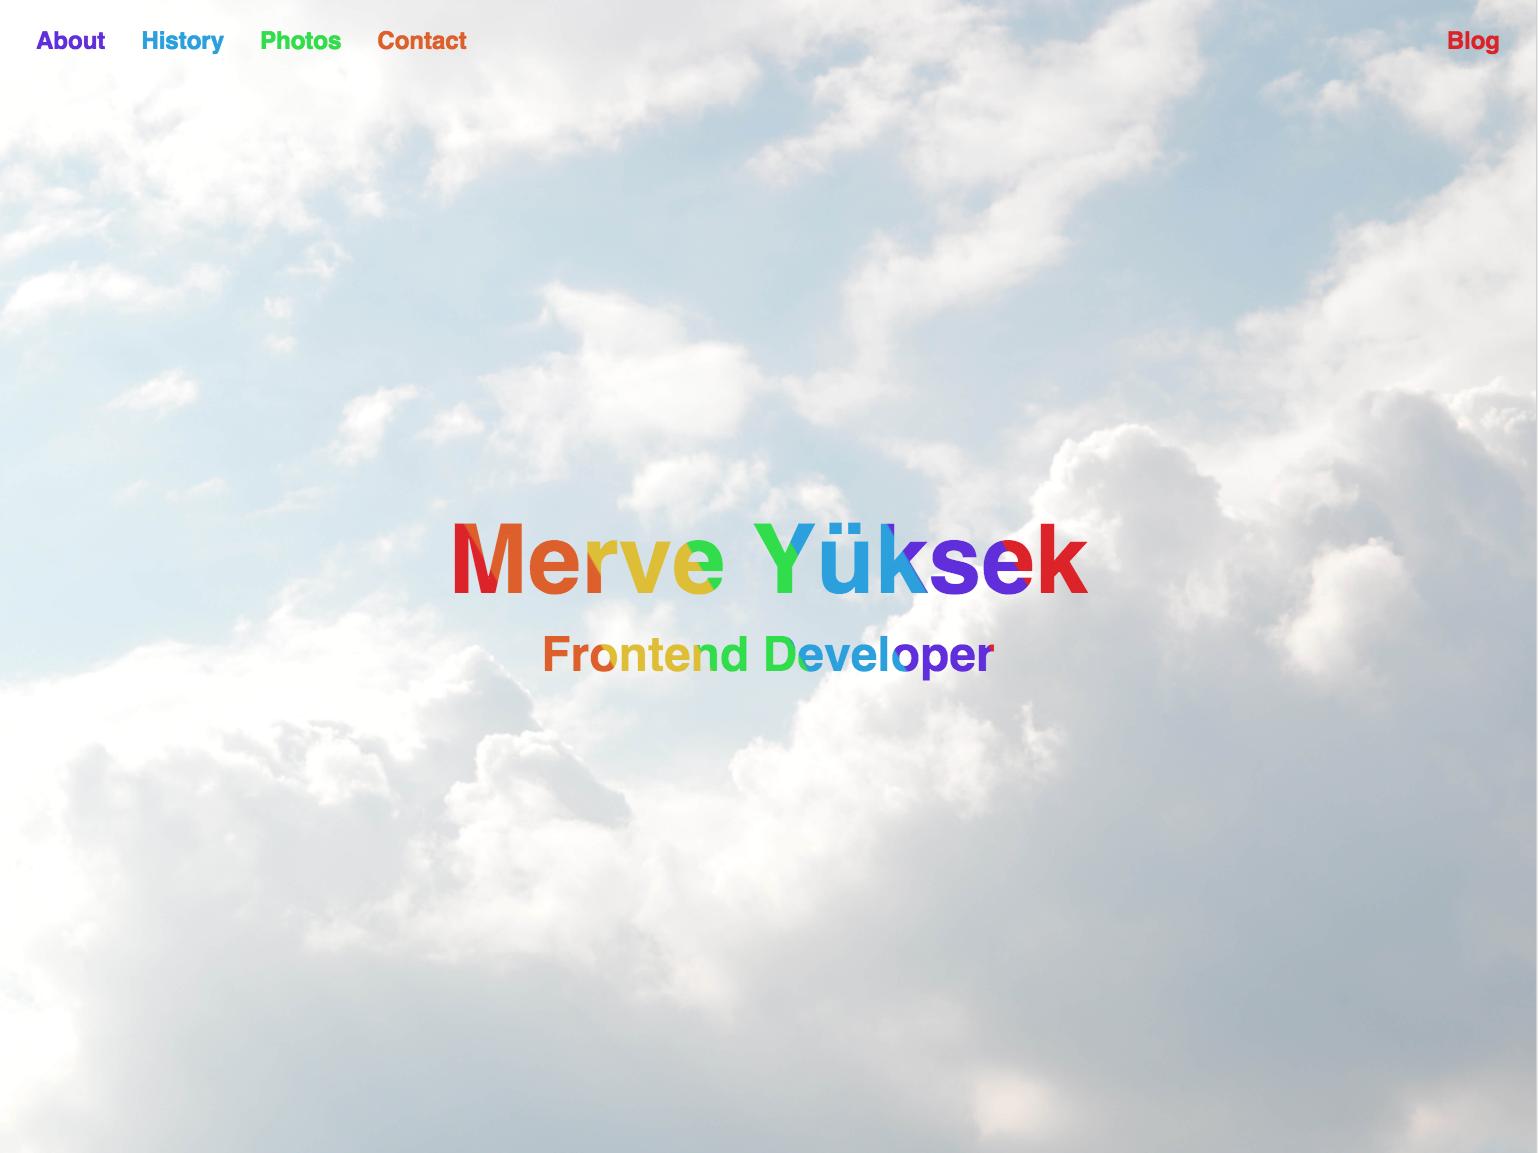 merveyuksek.com developer webpage